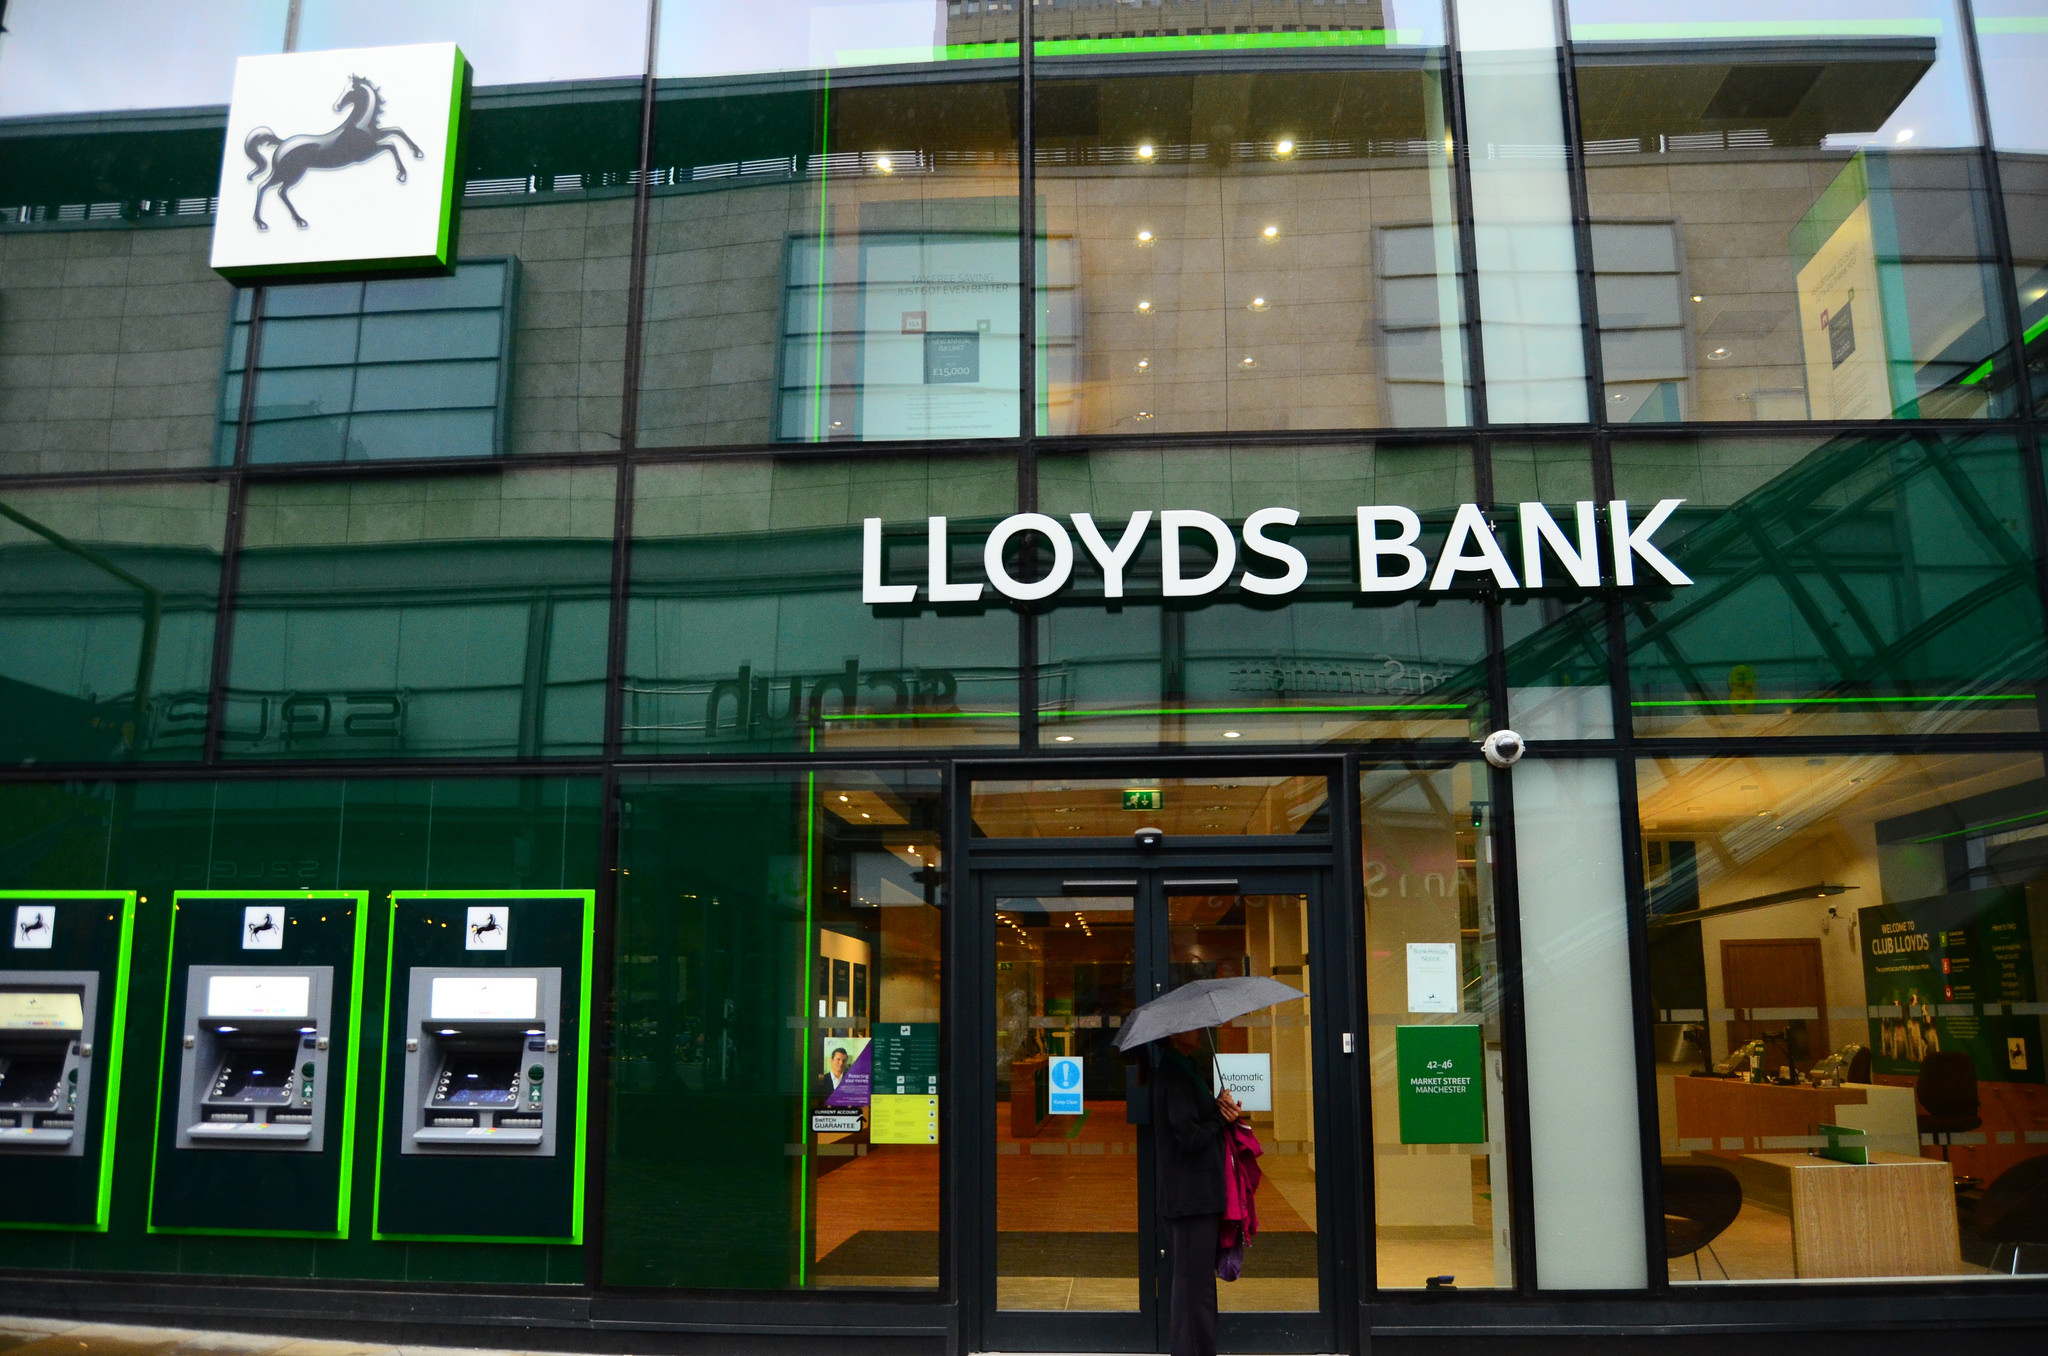 بنك-لويدز